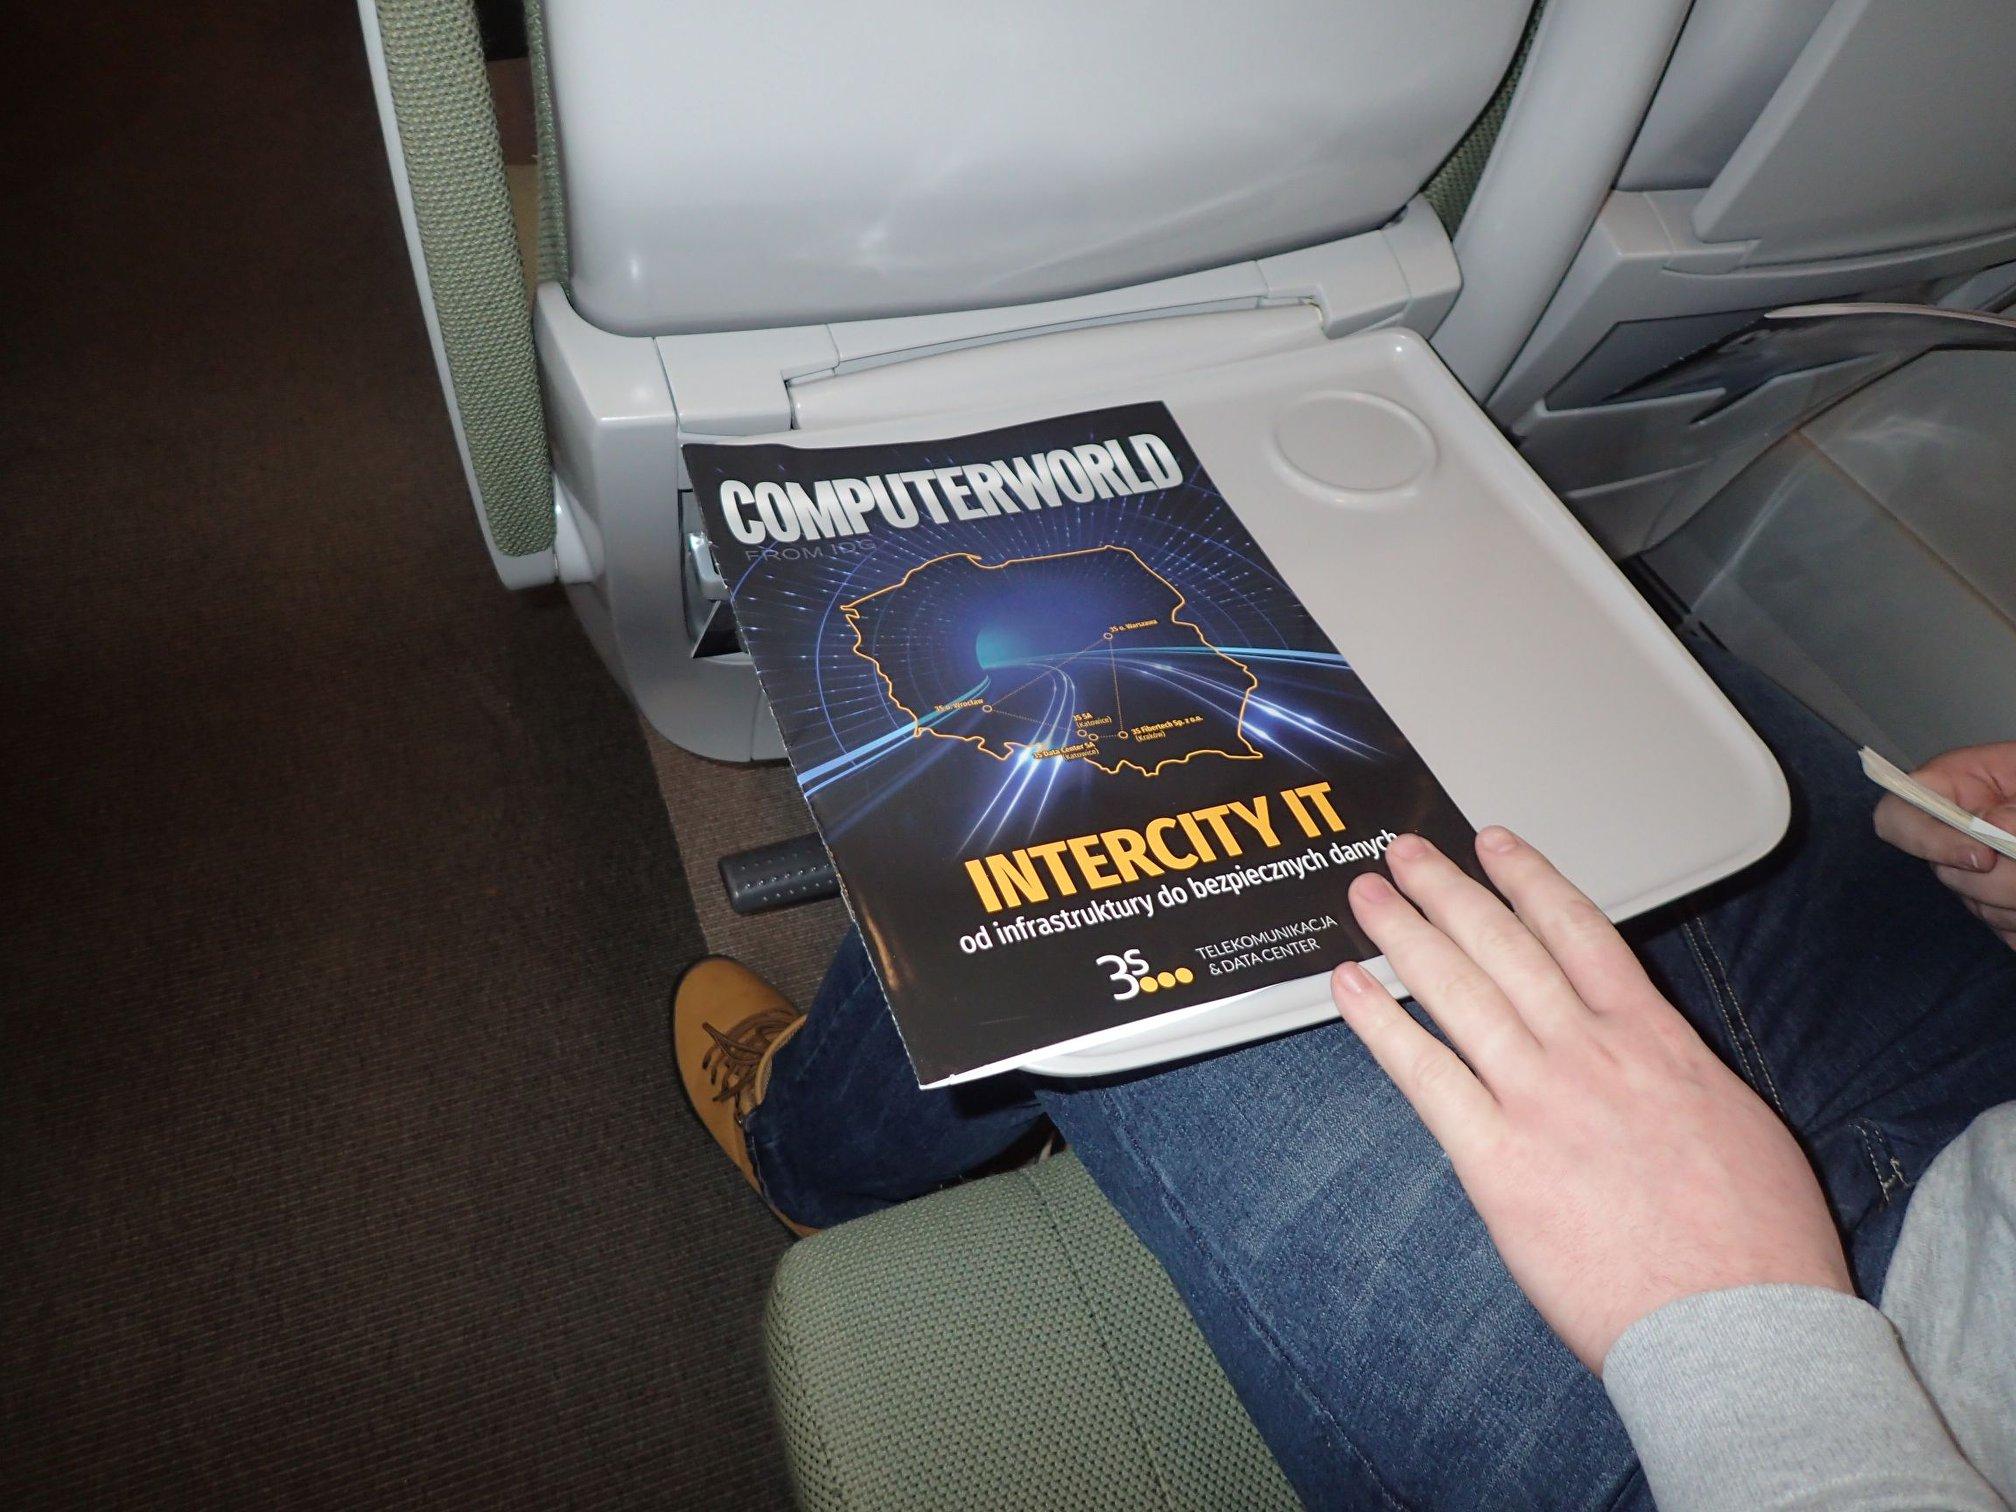 Intercity IT